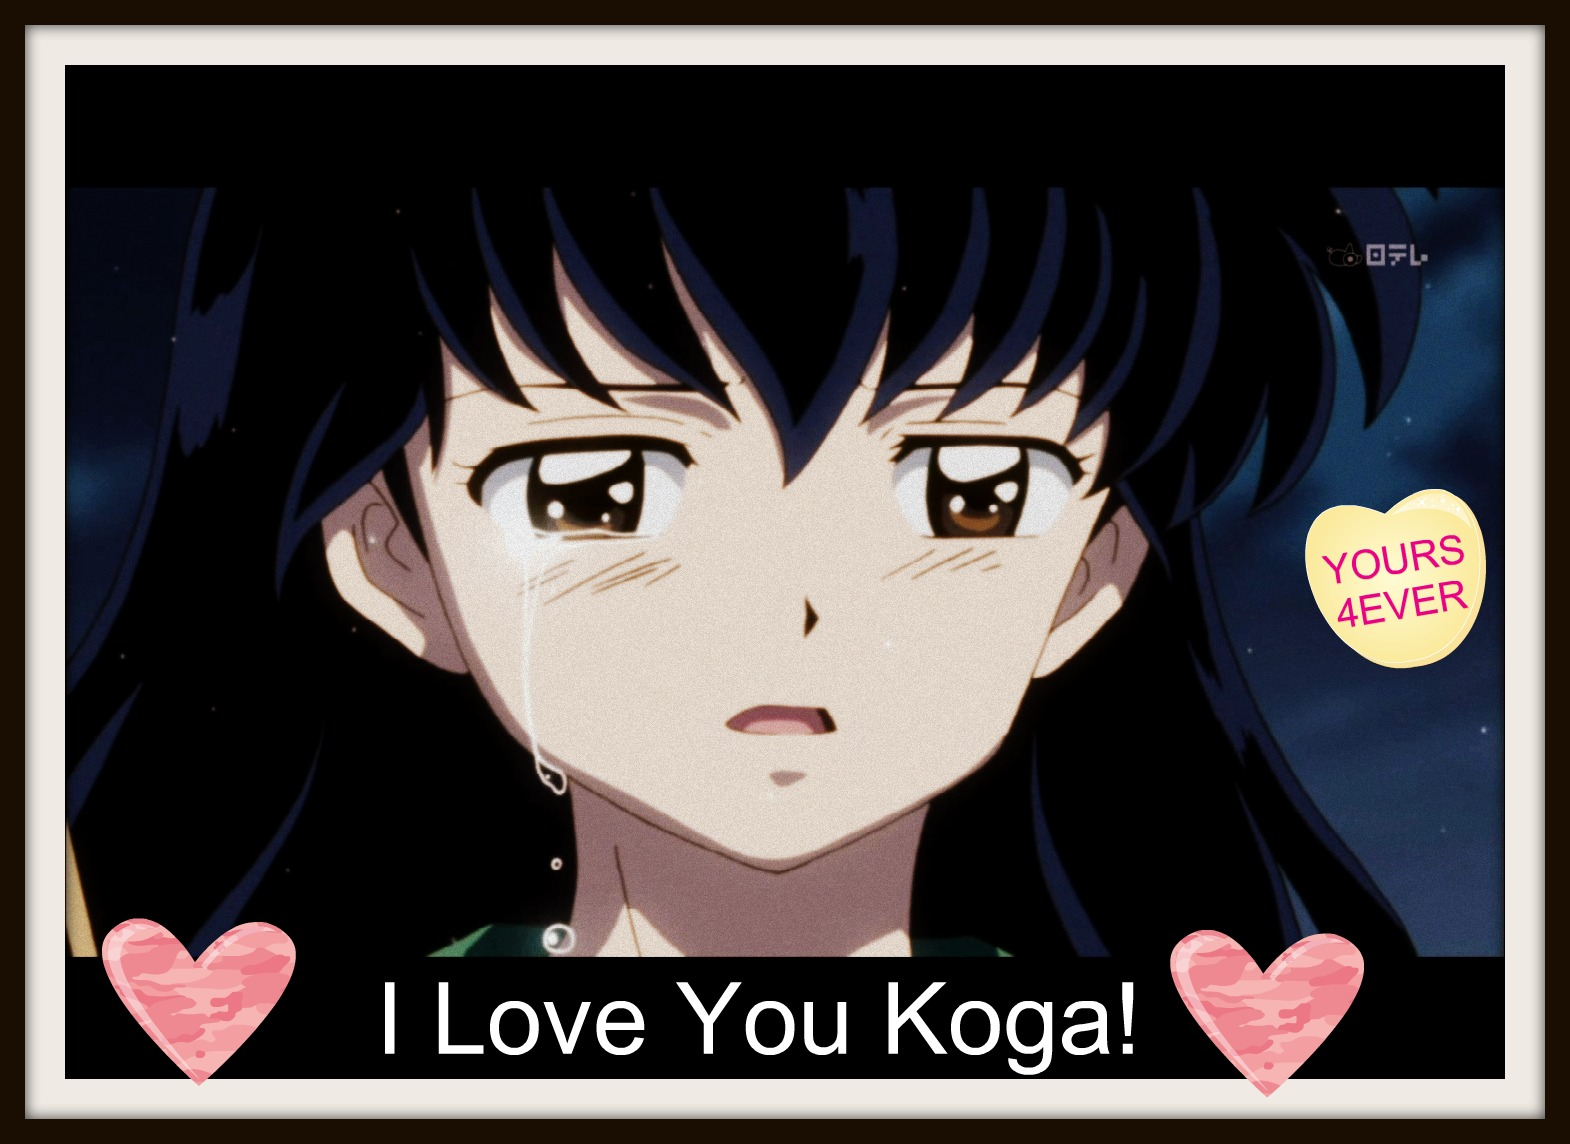 koga and kagome images Kagome: I love koga HD wallpaper ...